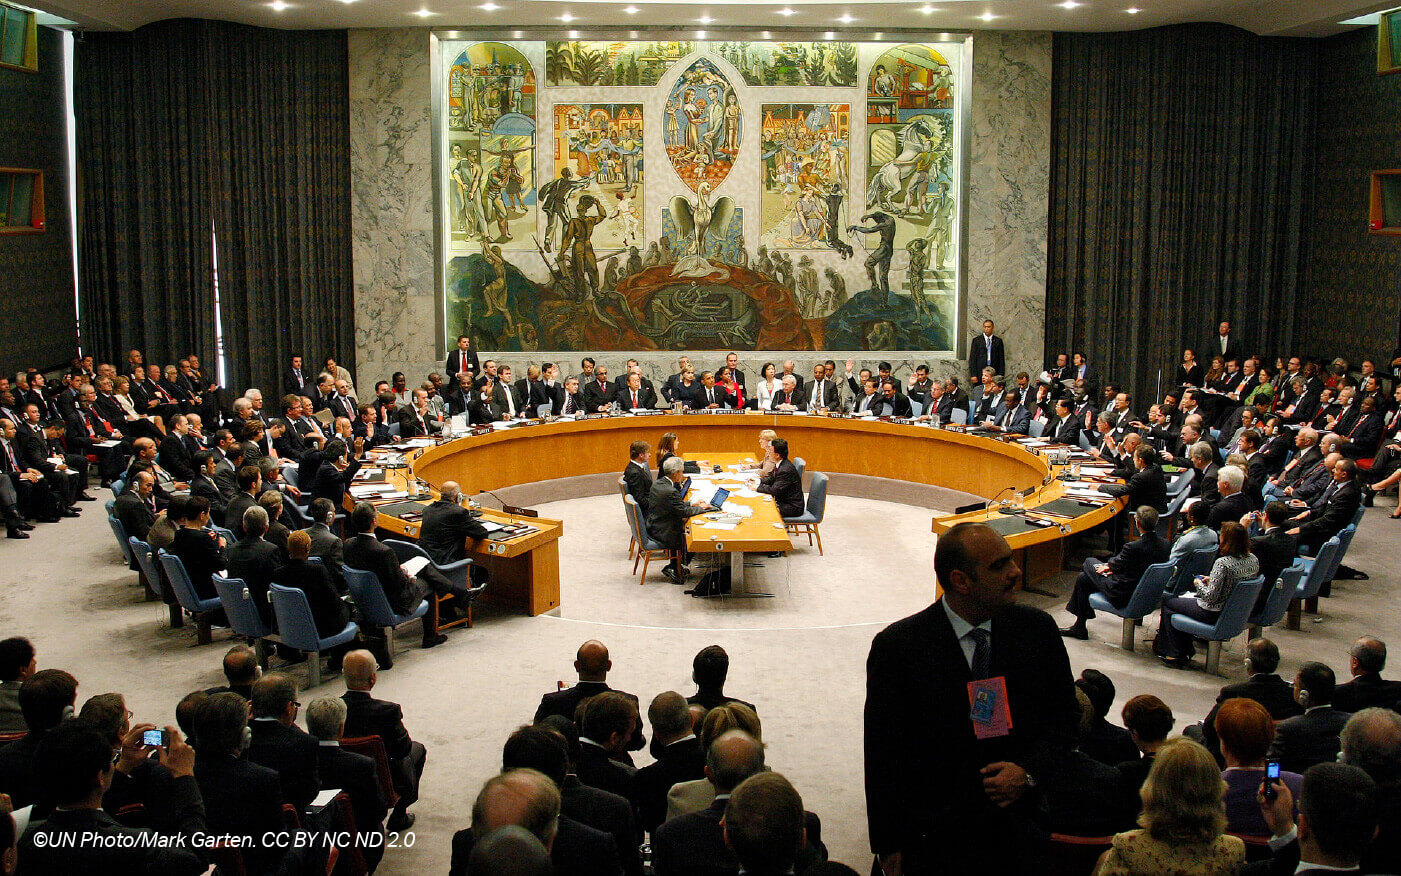 U.S. State Department Lifts Visa Restrictions and Sanctions Against International Criminal Court Personnel